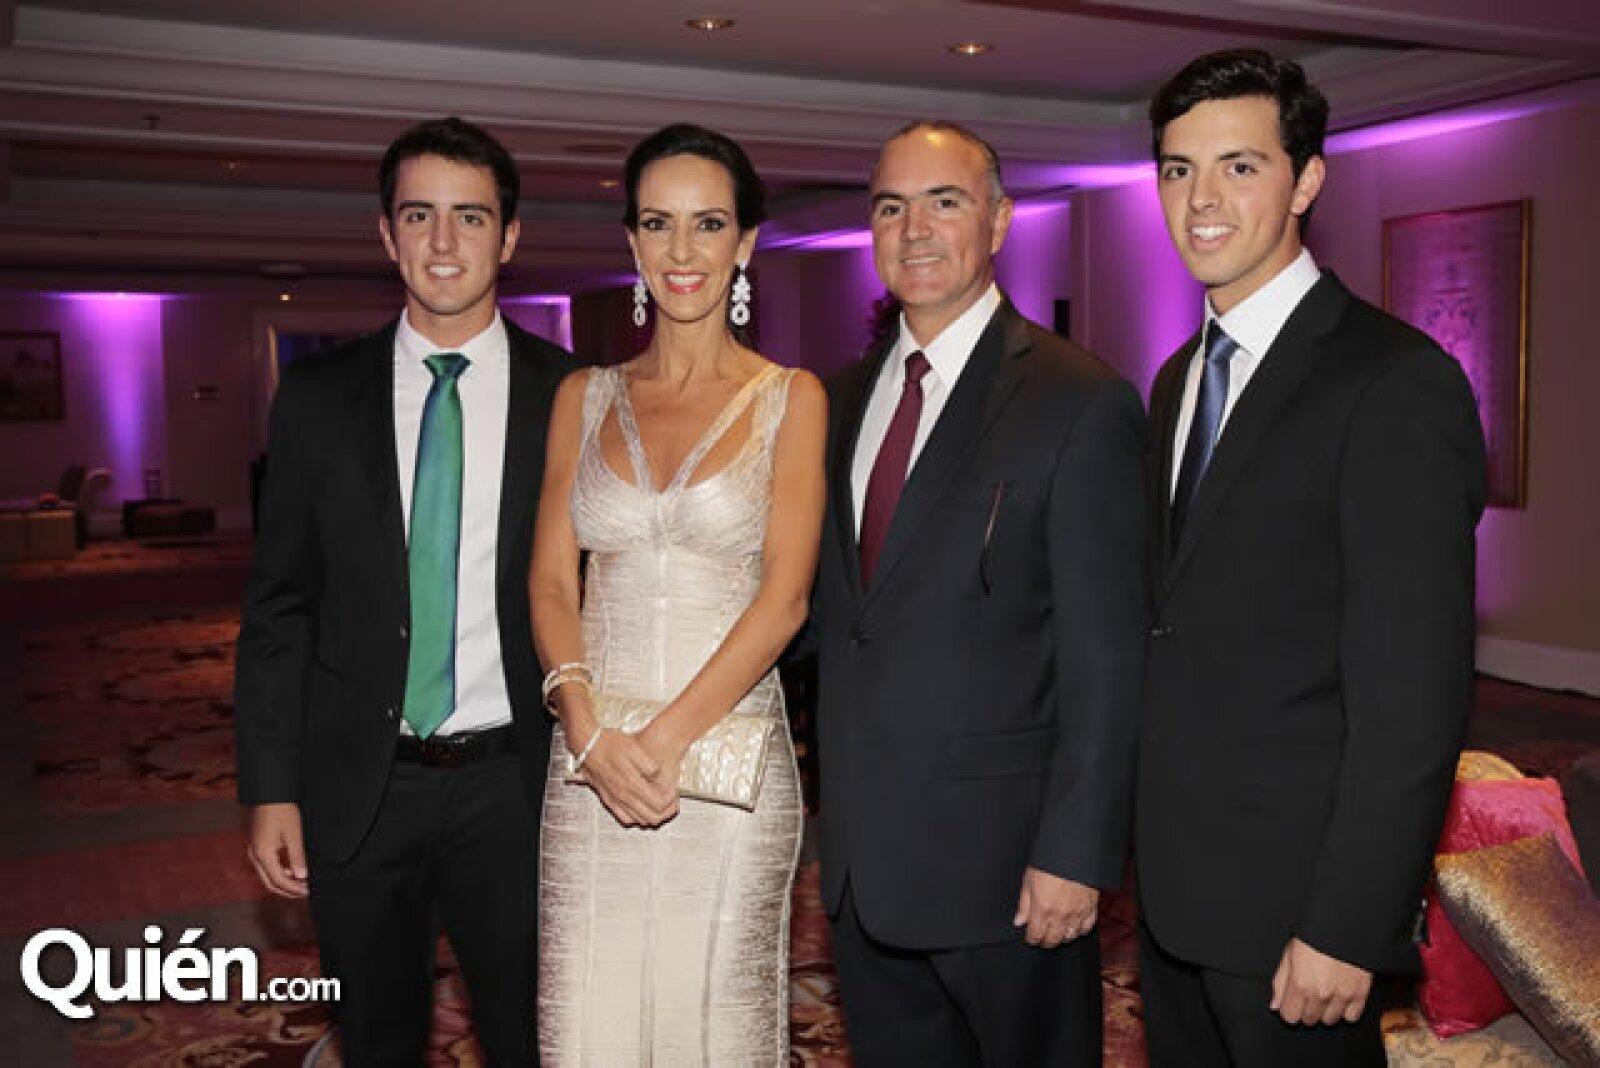 Diego Calzada,Sandra Albarrán,José Calzada,José Calzada